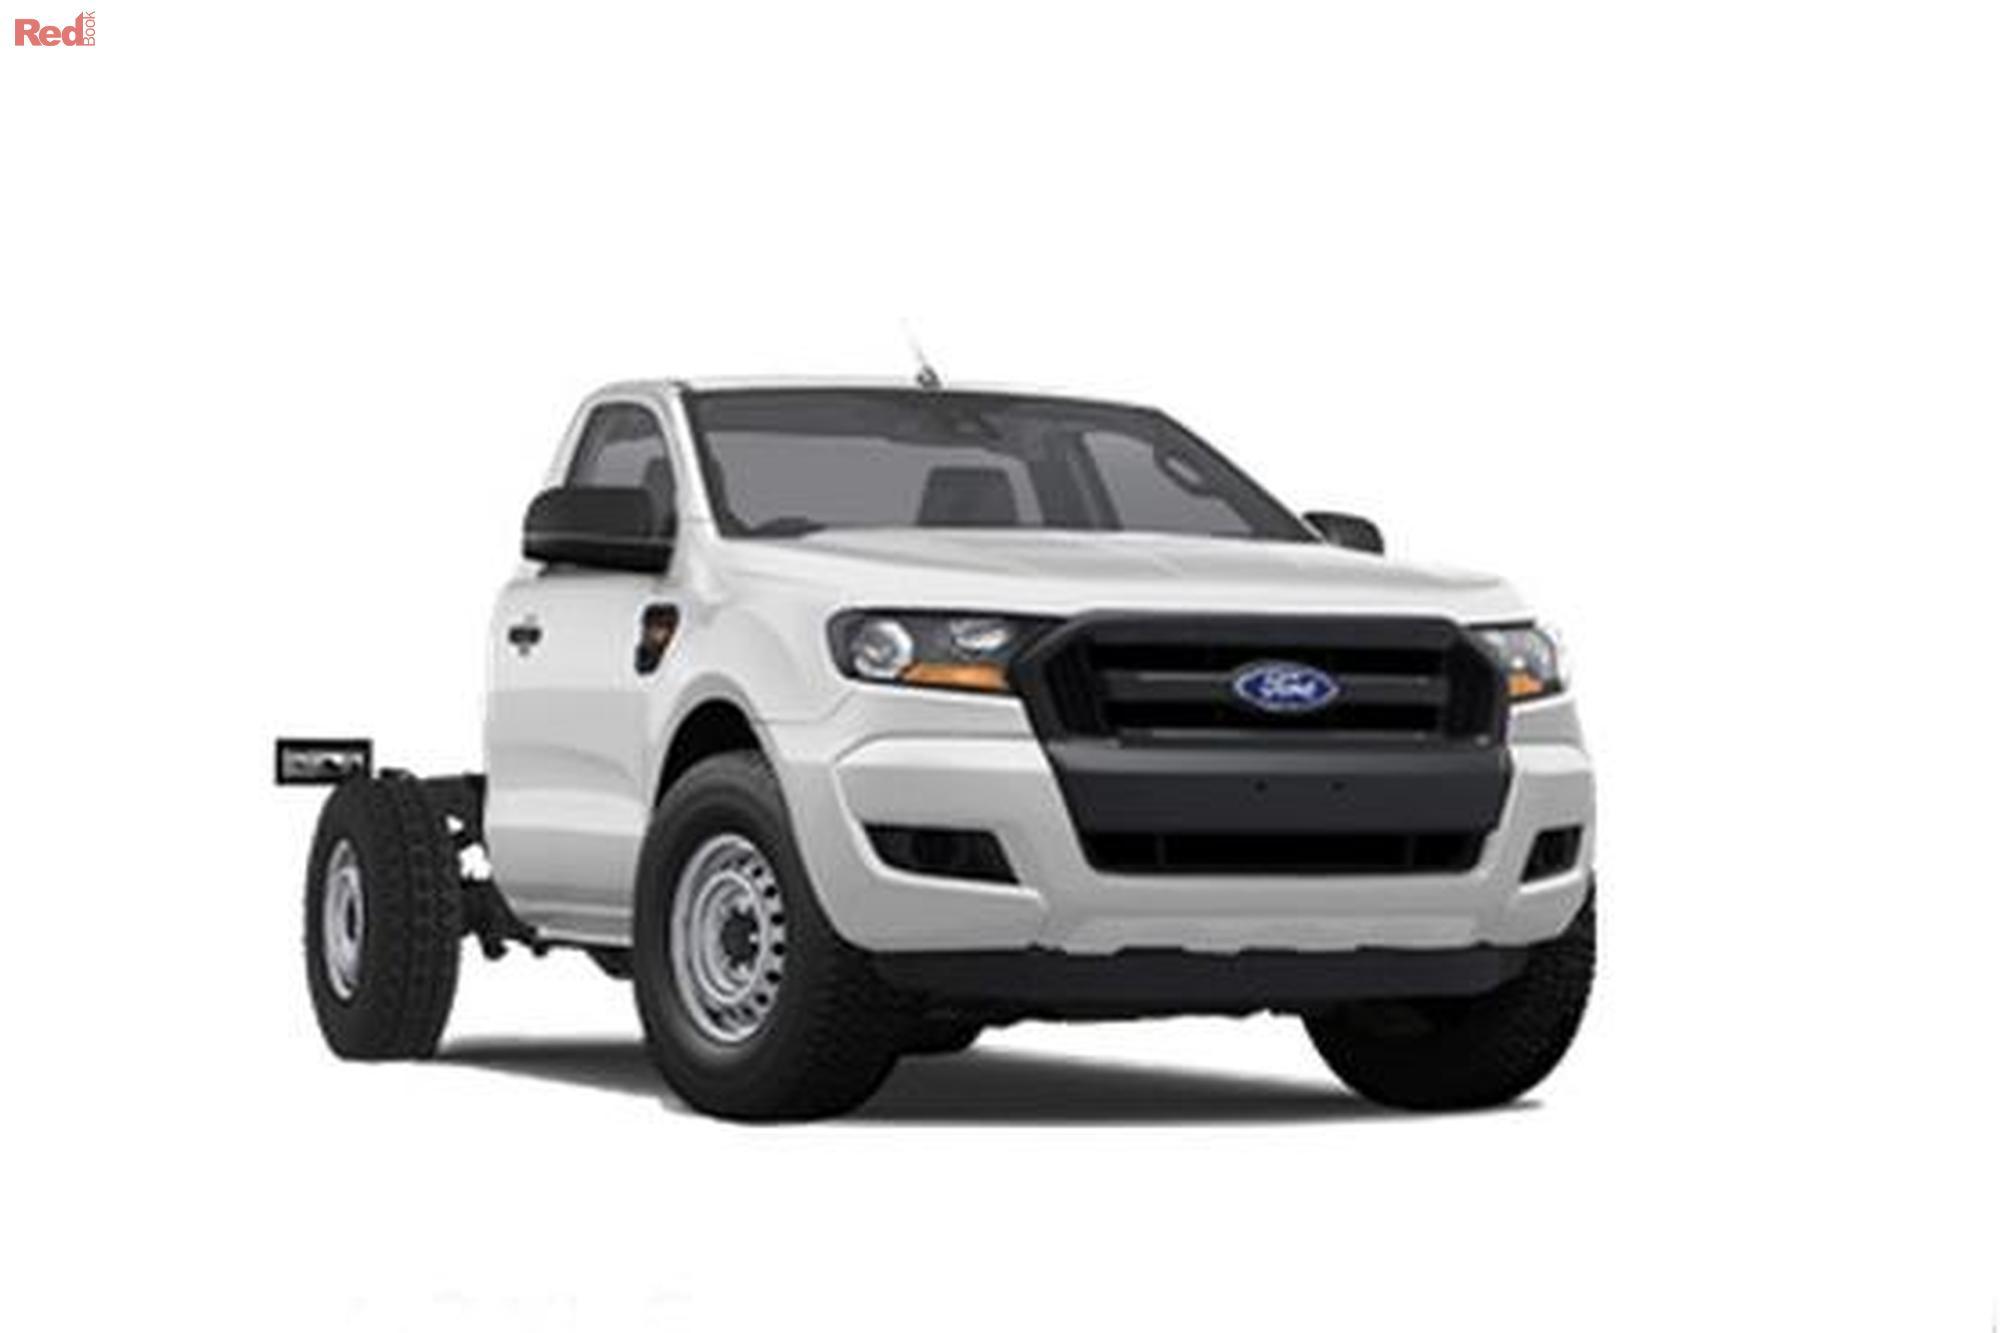 2018 Ford Ranger Xl Manual Georgie 2017